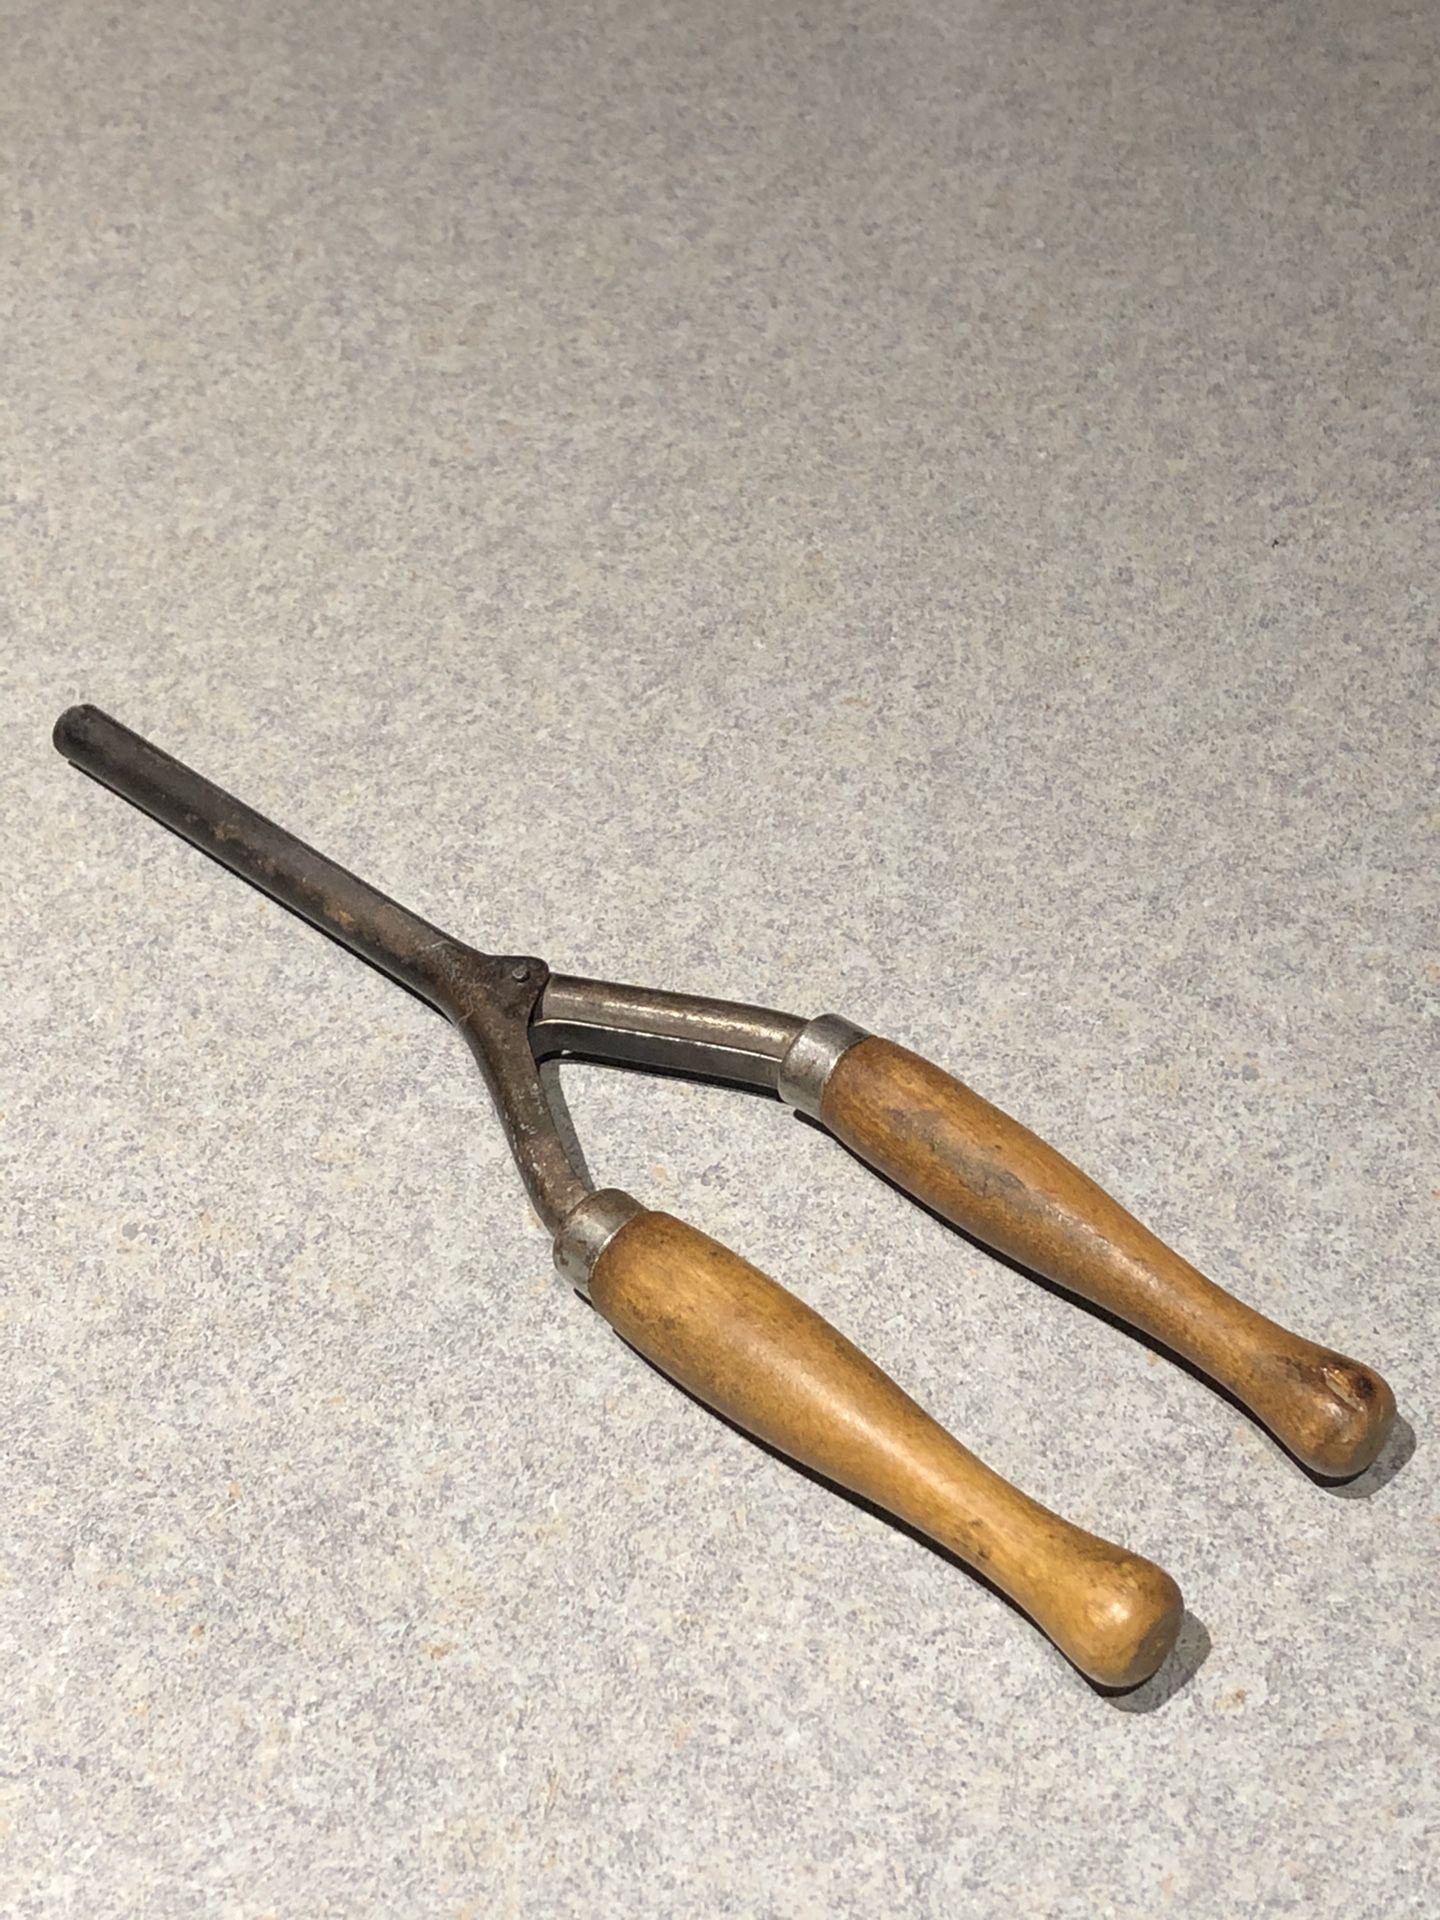 Vintage curling iron